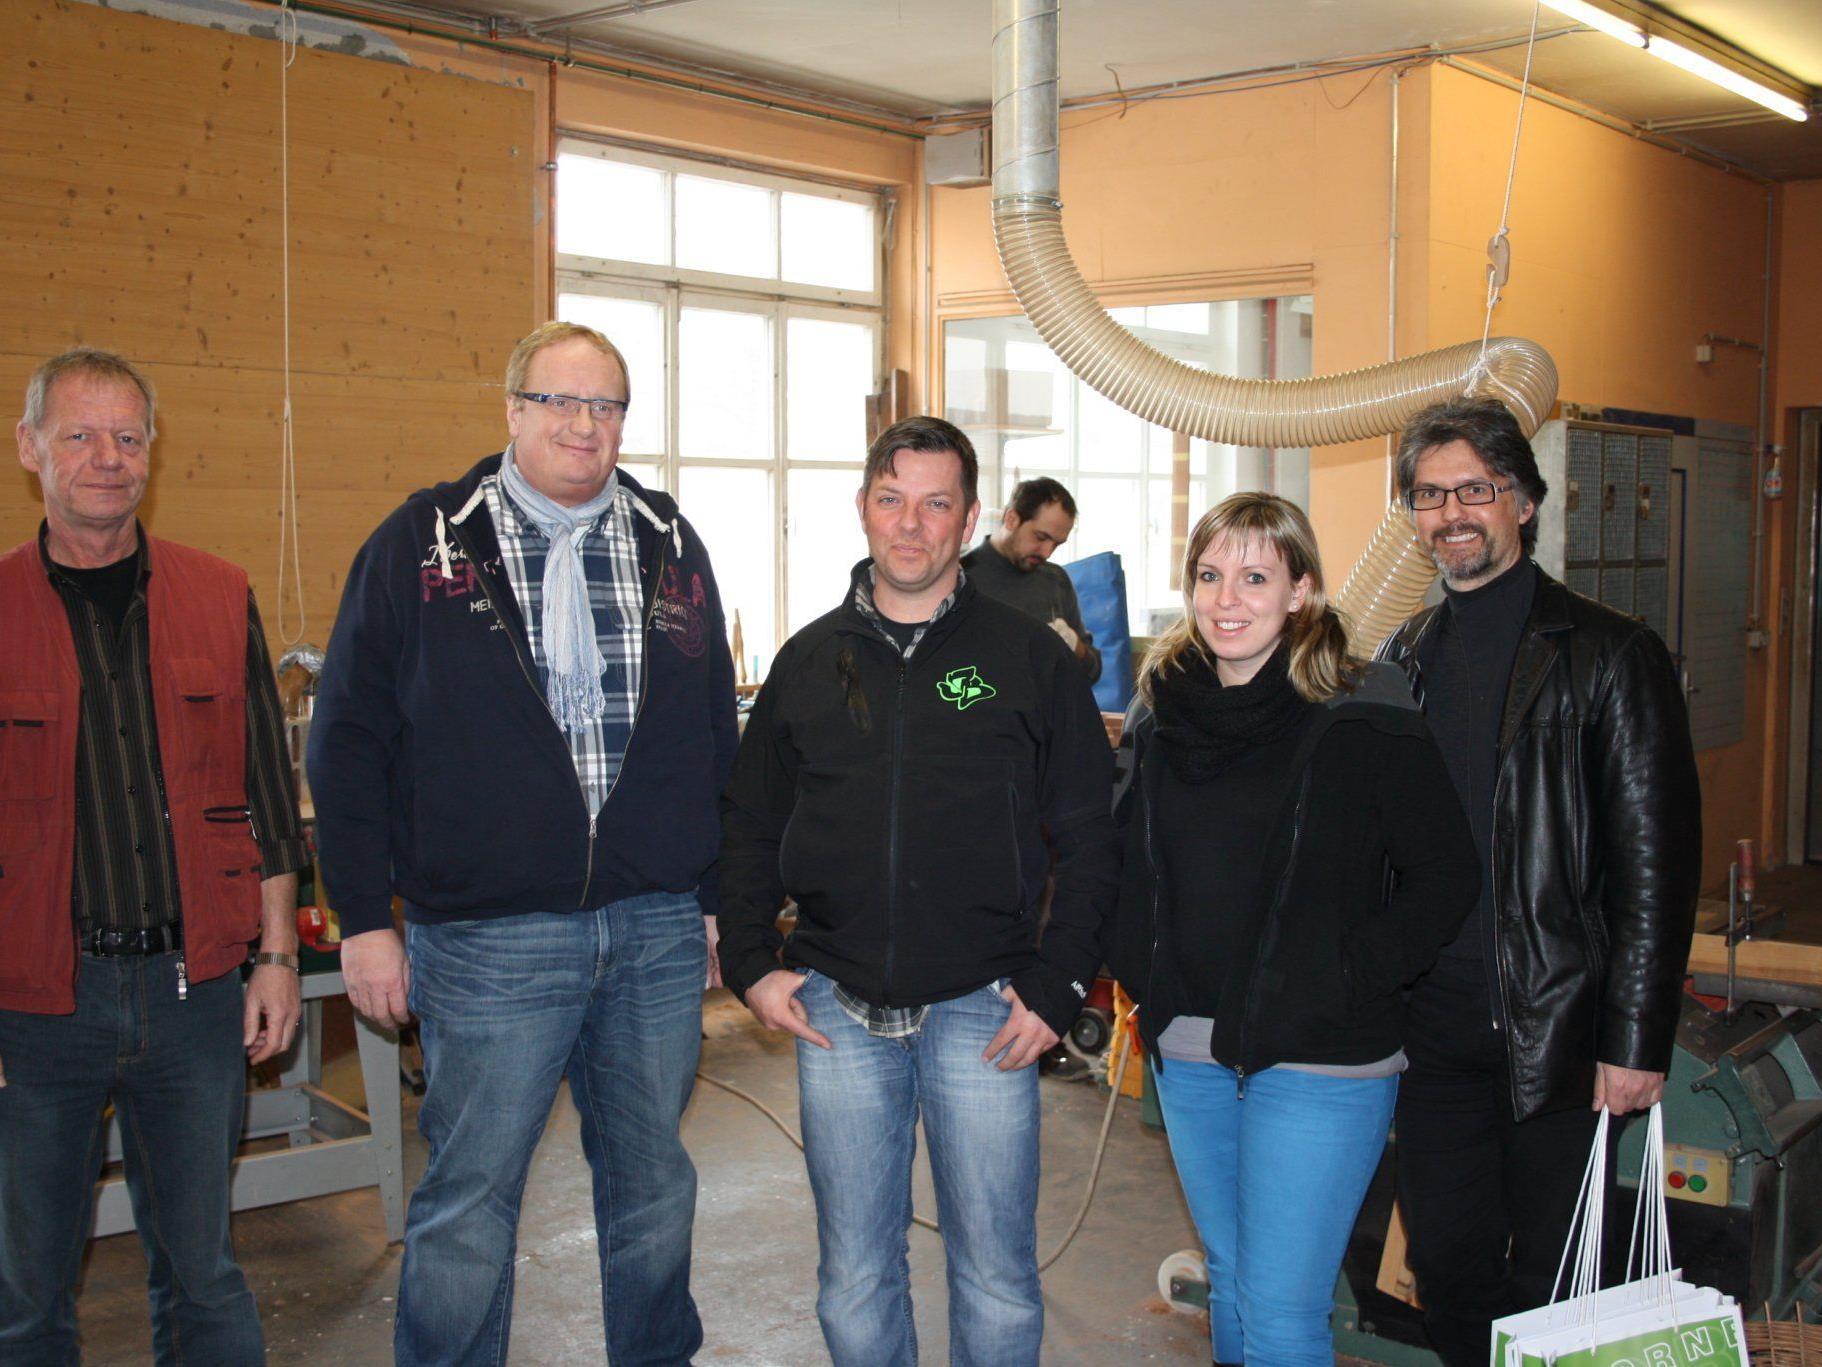 v.l.n.r.: Martin Hagen, Richard Groer, Lothar Girrbach, Karolin Schnippa, Elmar Luger